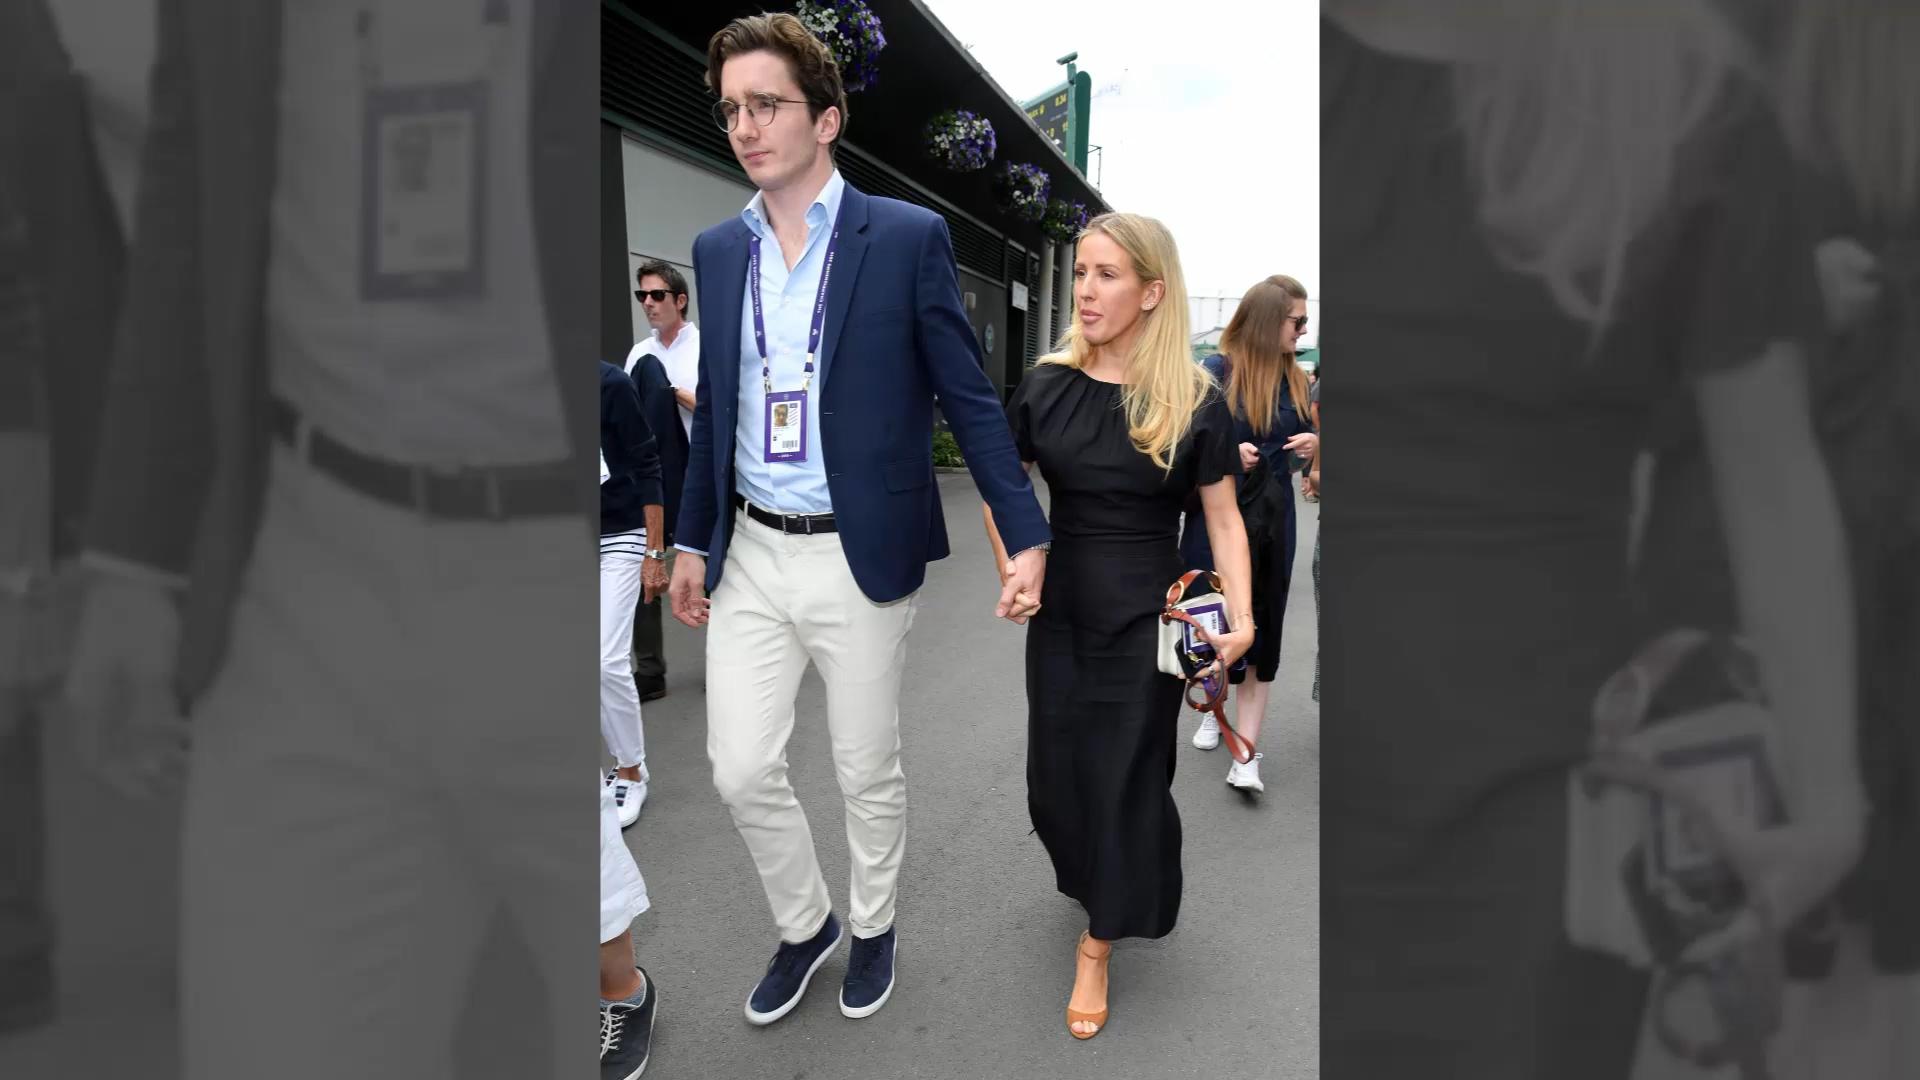 Ellie Goulding marries art dealer fiance